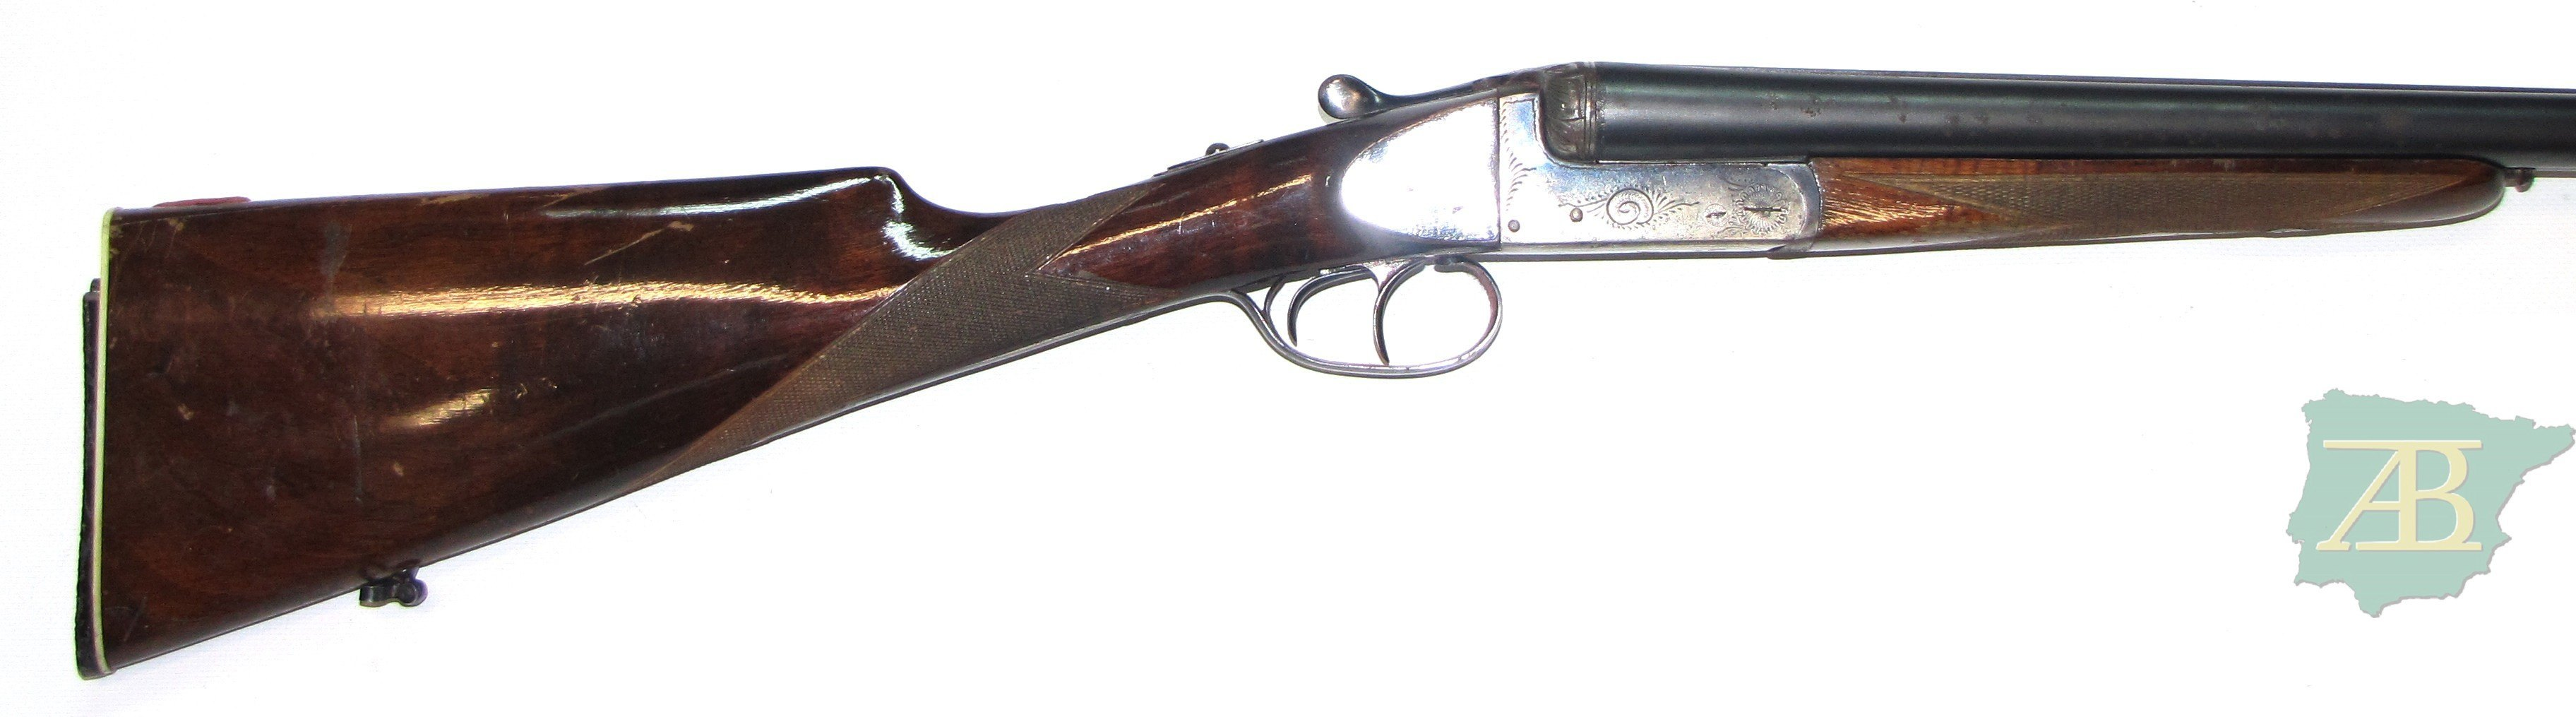 Escopeta paralela caza gama baja IGNACIO UGARTECHEA ref 4848-armeriaiberica-2